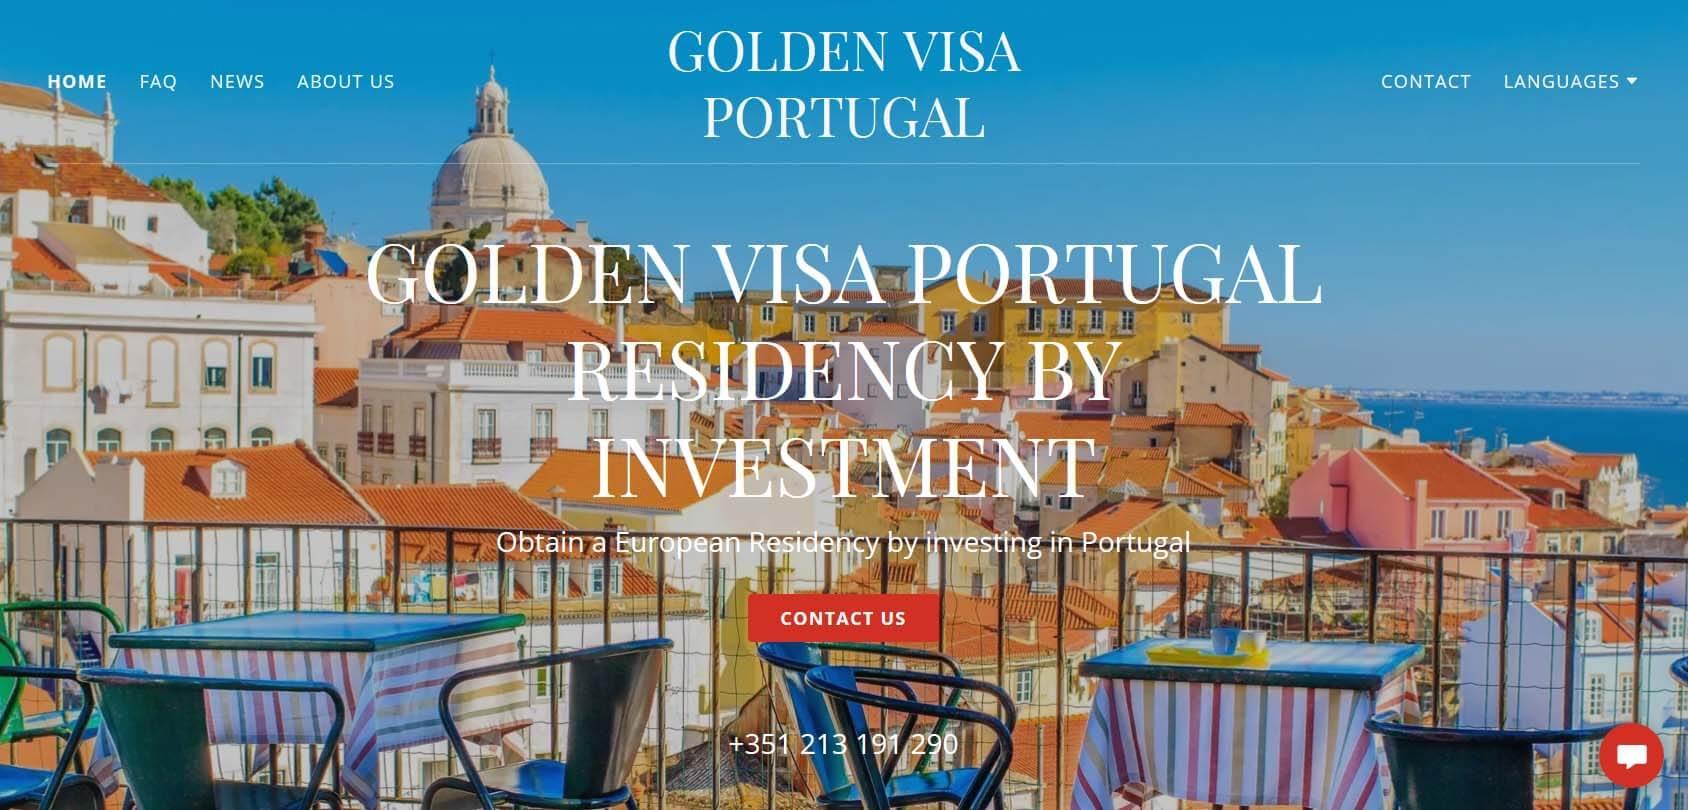 Golden Visa Portugal Homepage